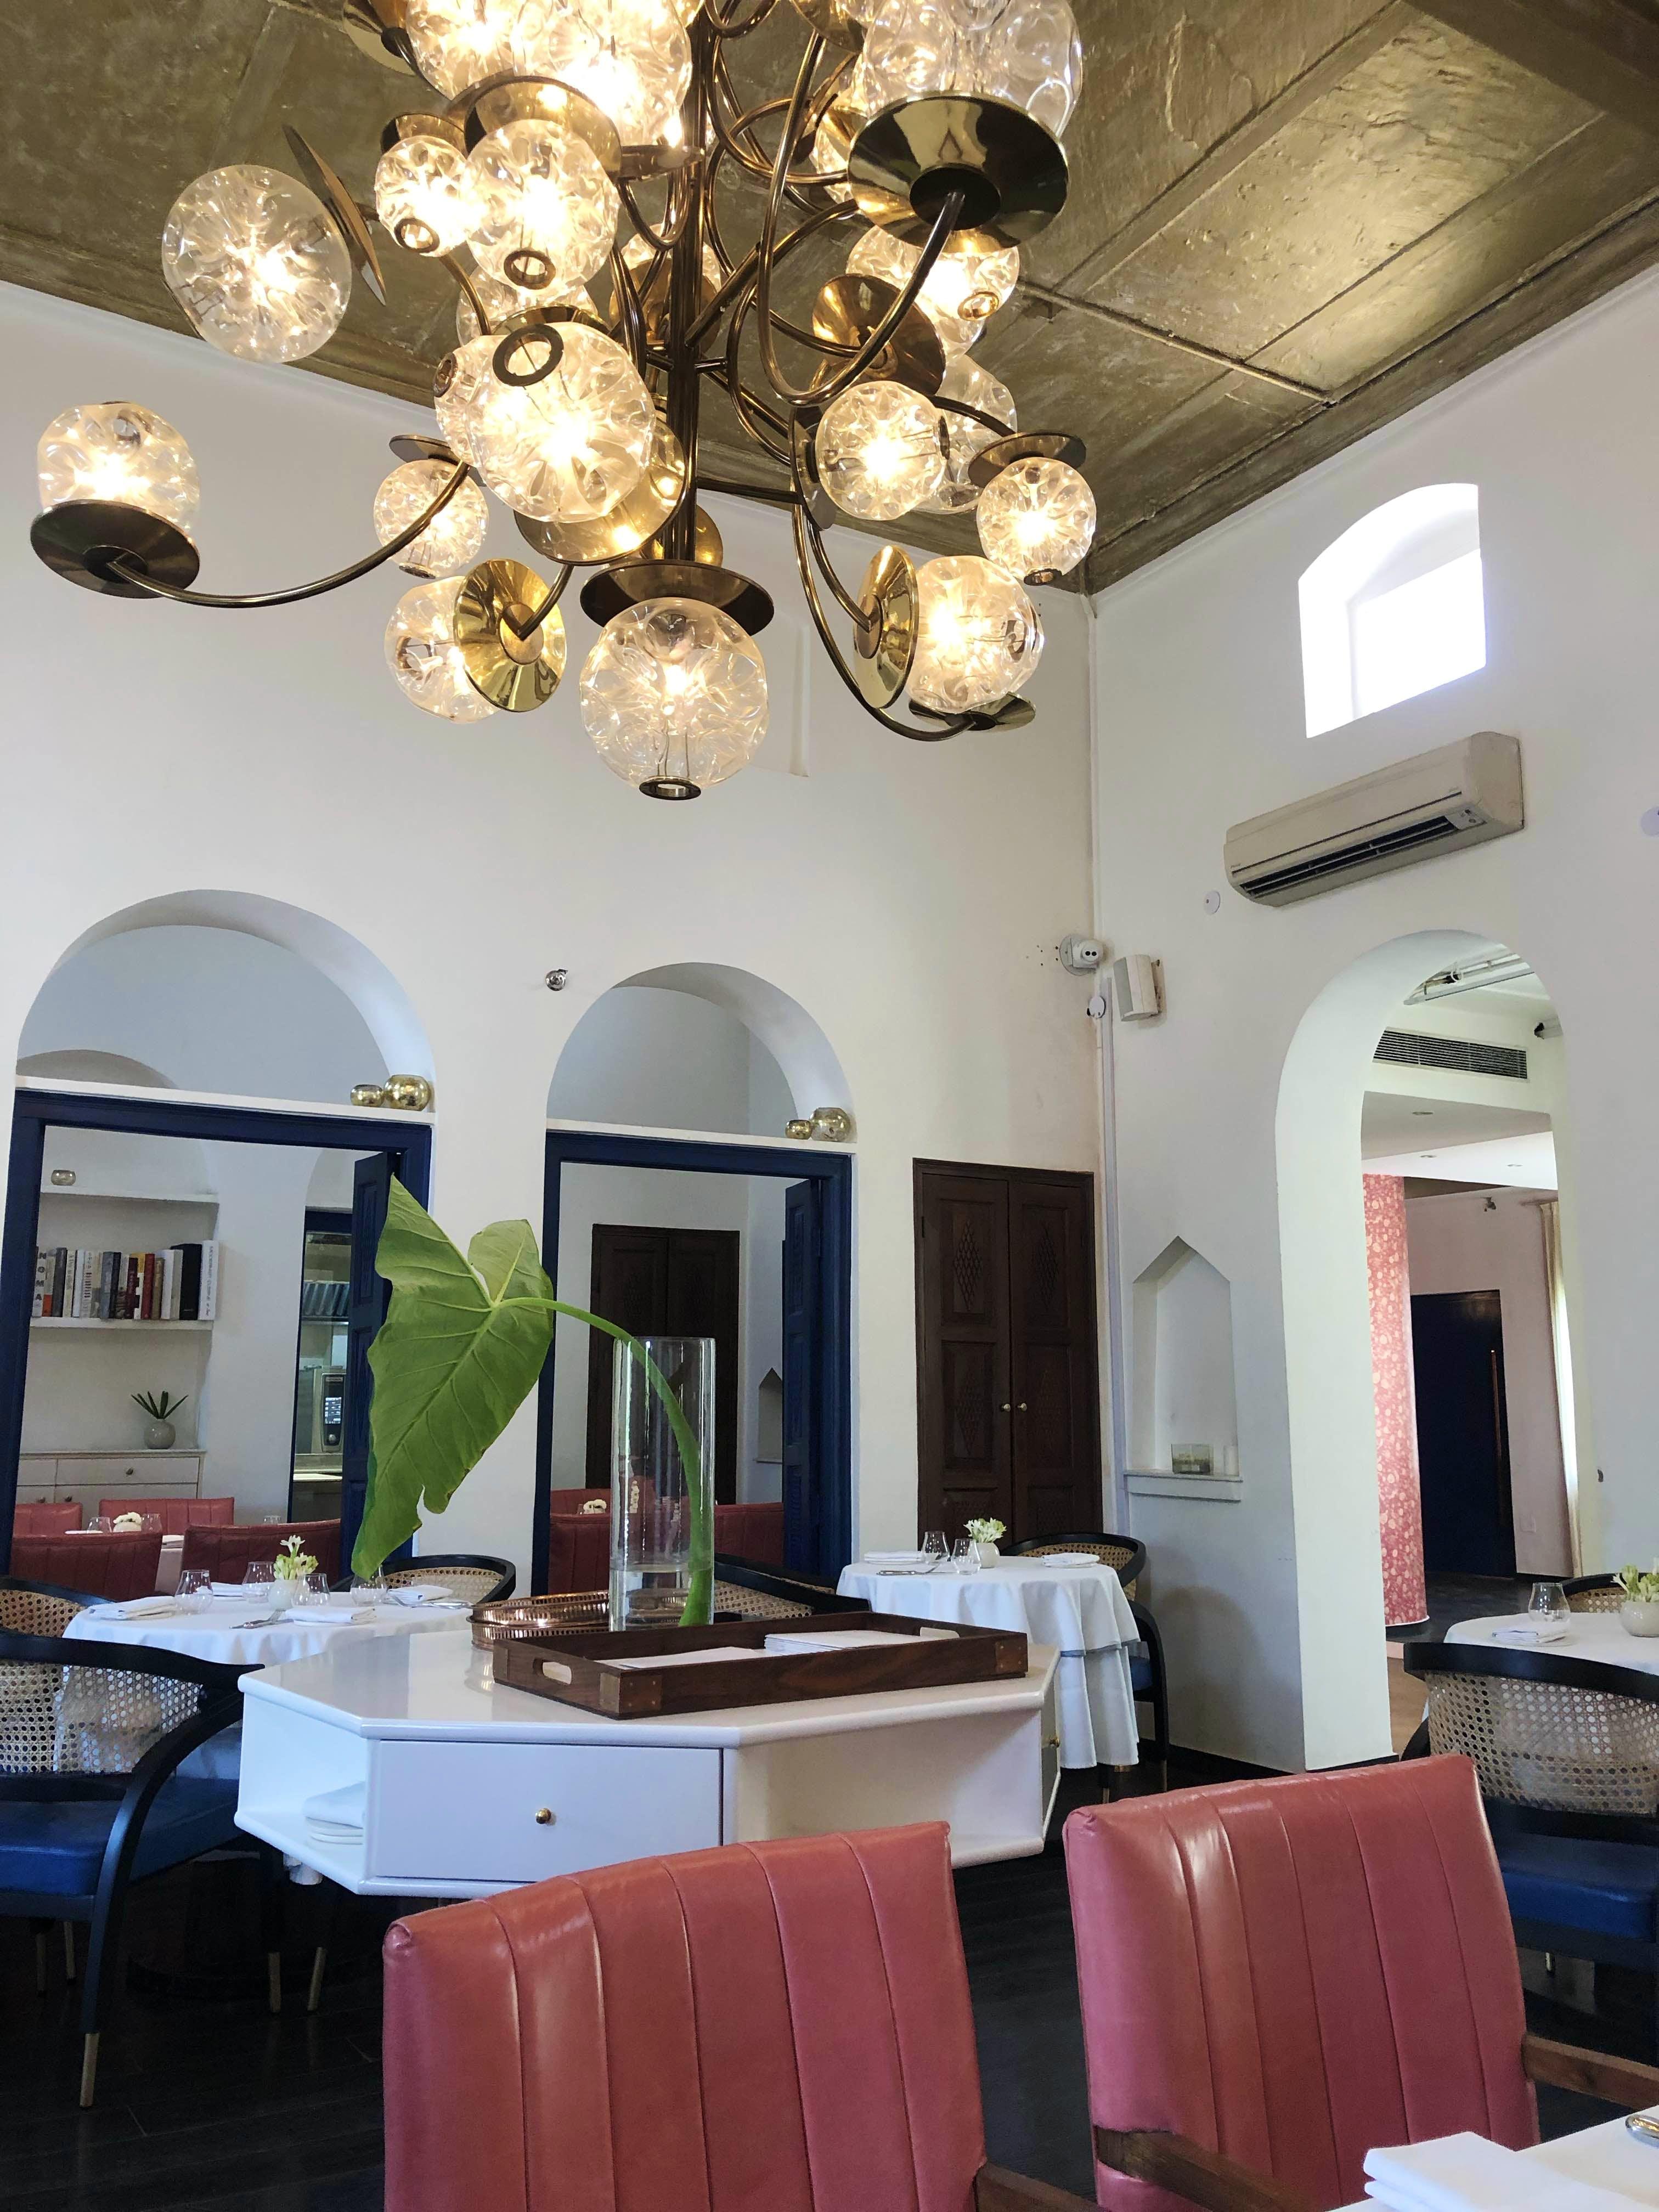 Ceiling,Room,Interior design,Property,Lighting,Chandelier,Light fixture,Dining room,Building,Table